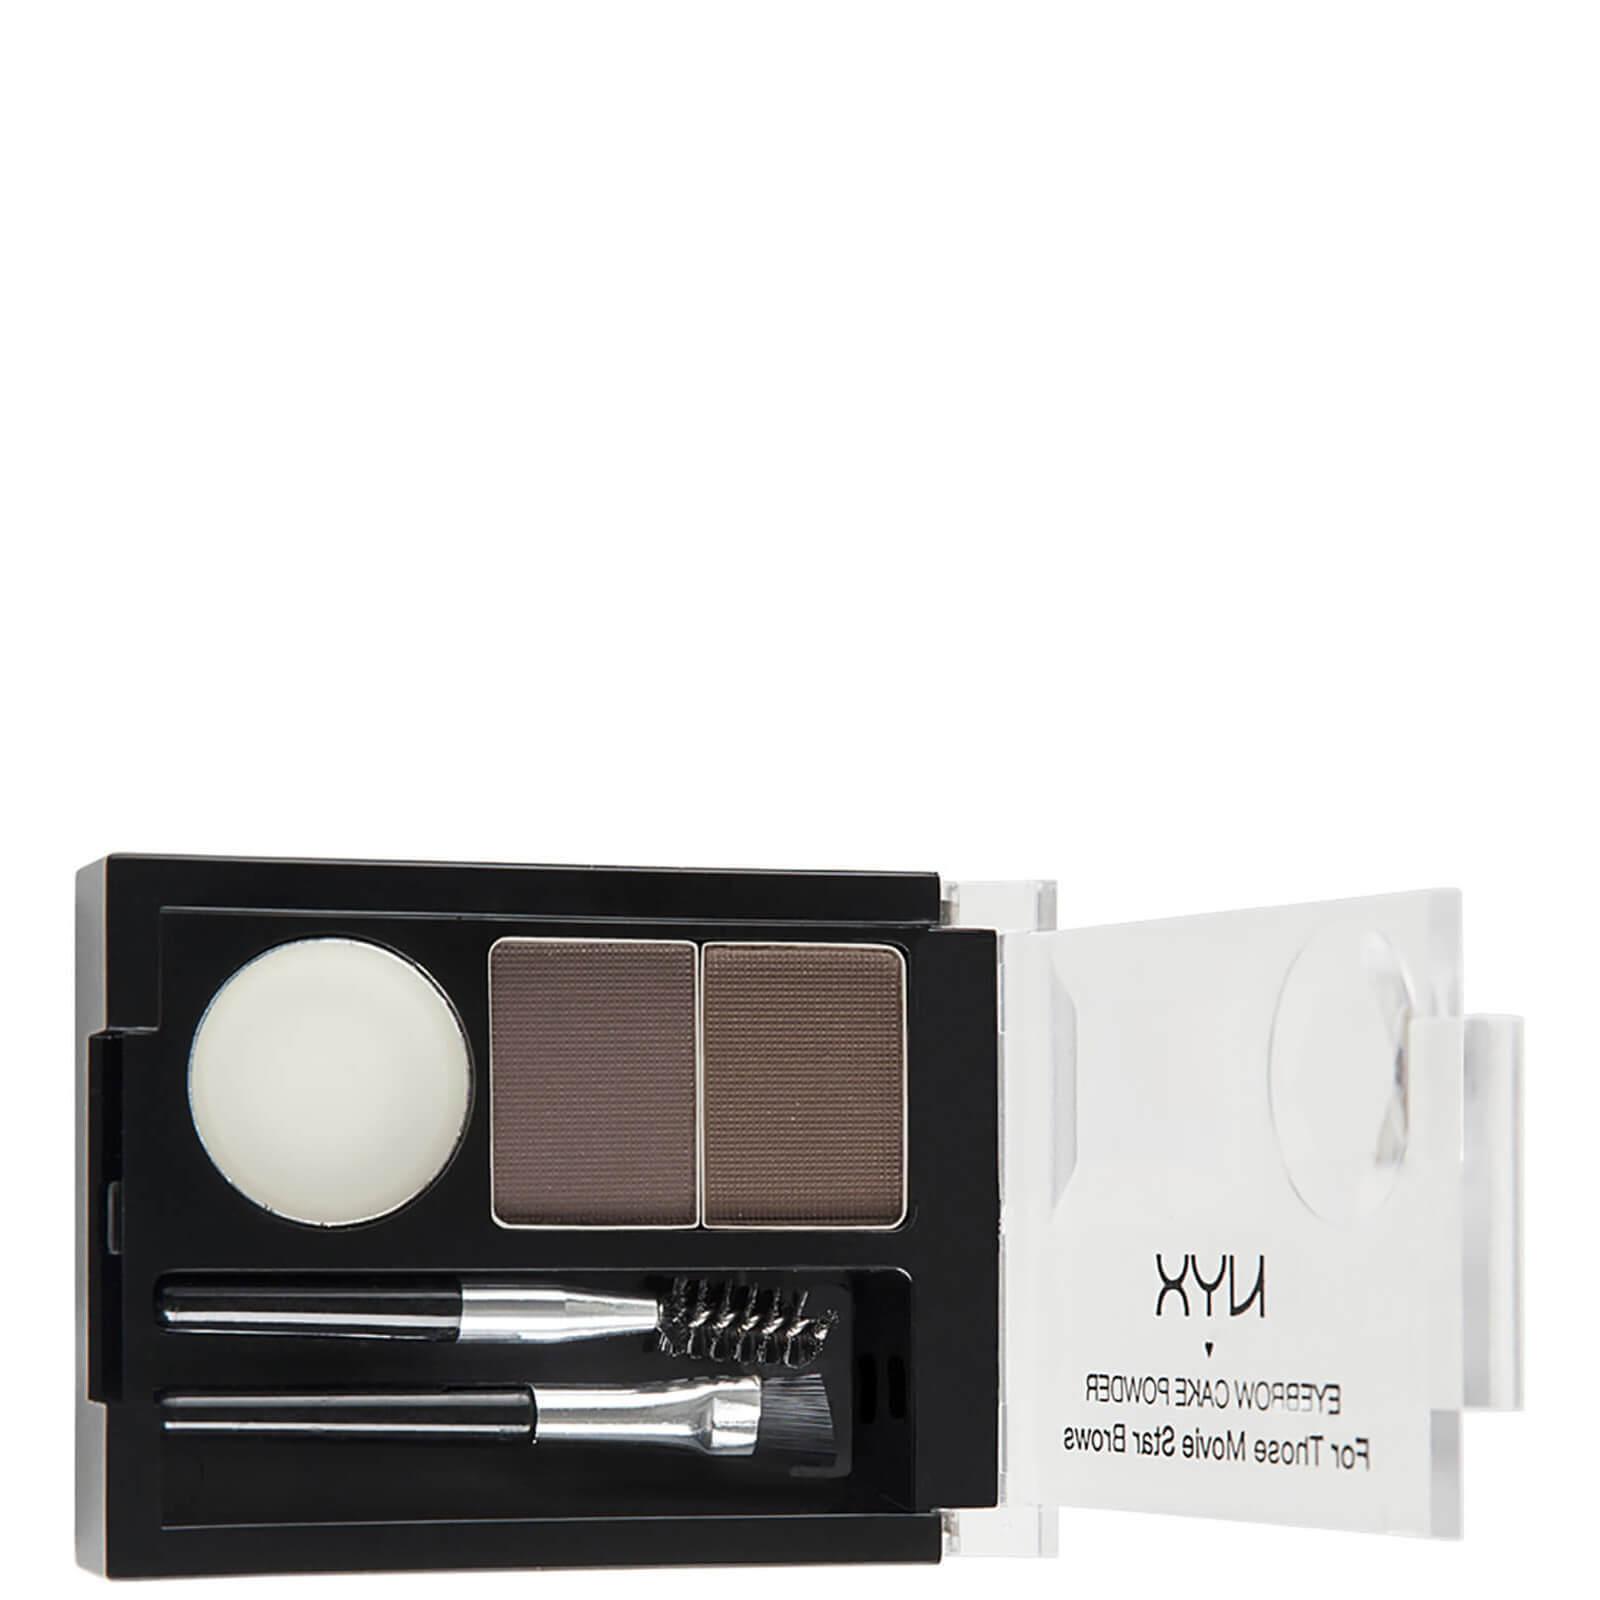 Купить NYX Professional Makeup Eyebrow Cake Powder - Dark Brown/ Brown